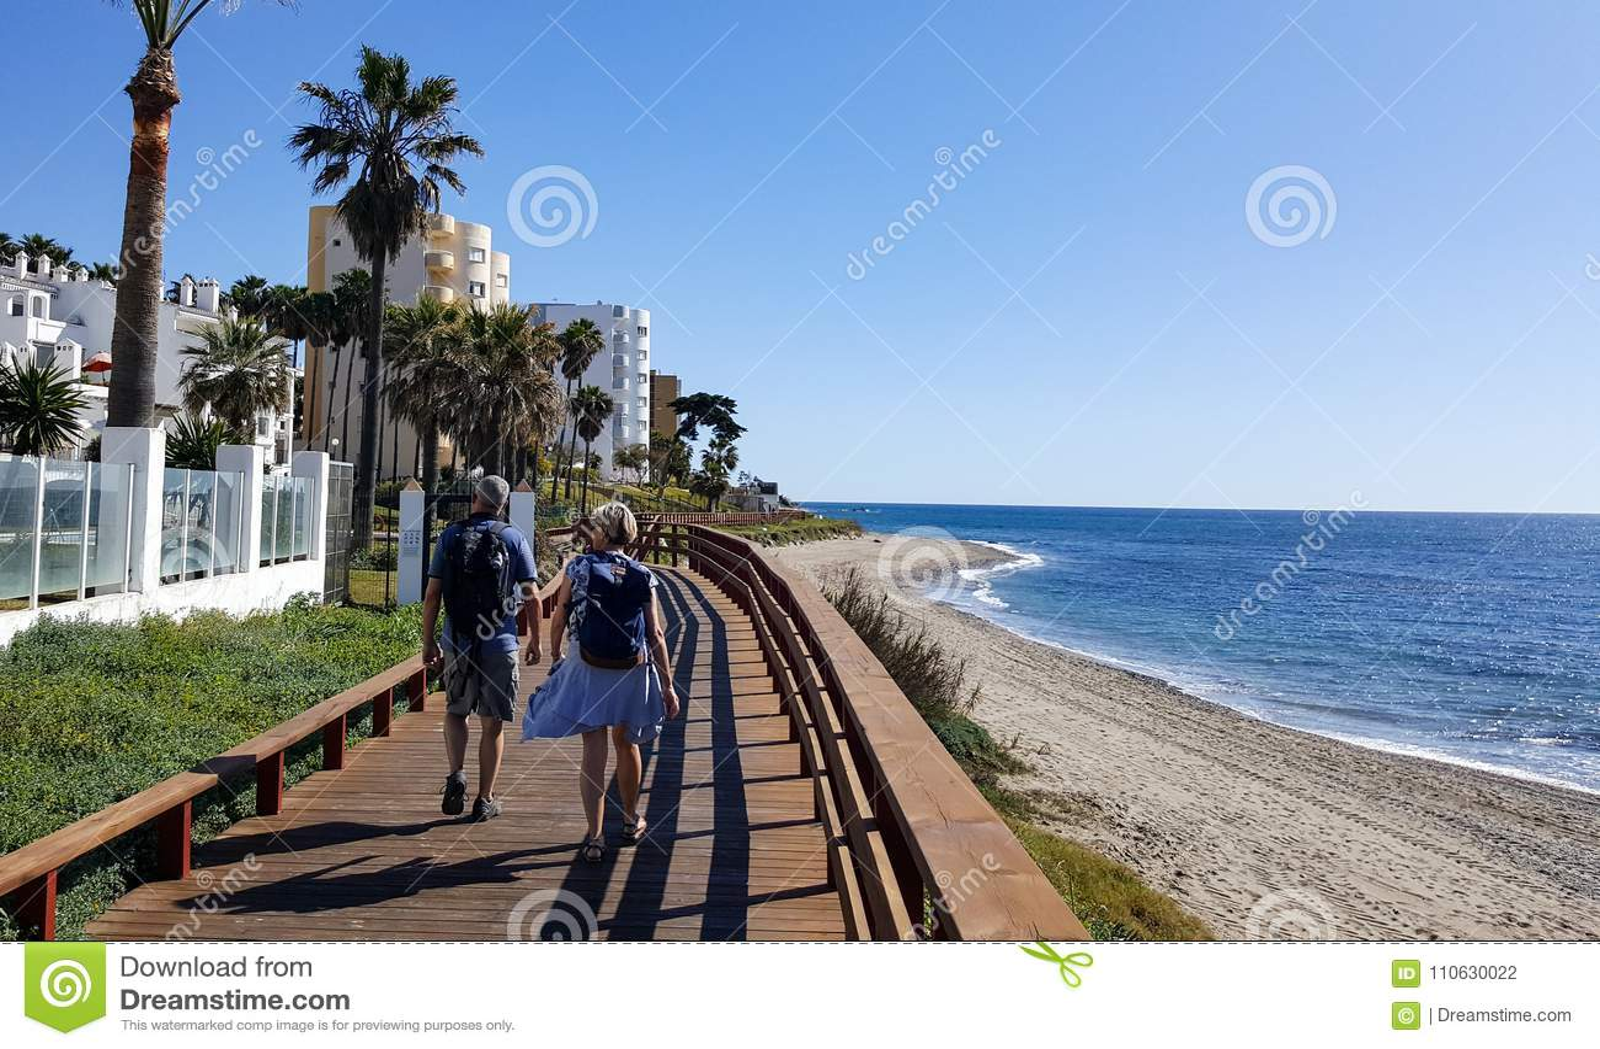 Two people walking on the coast of Mediterranean